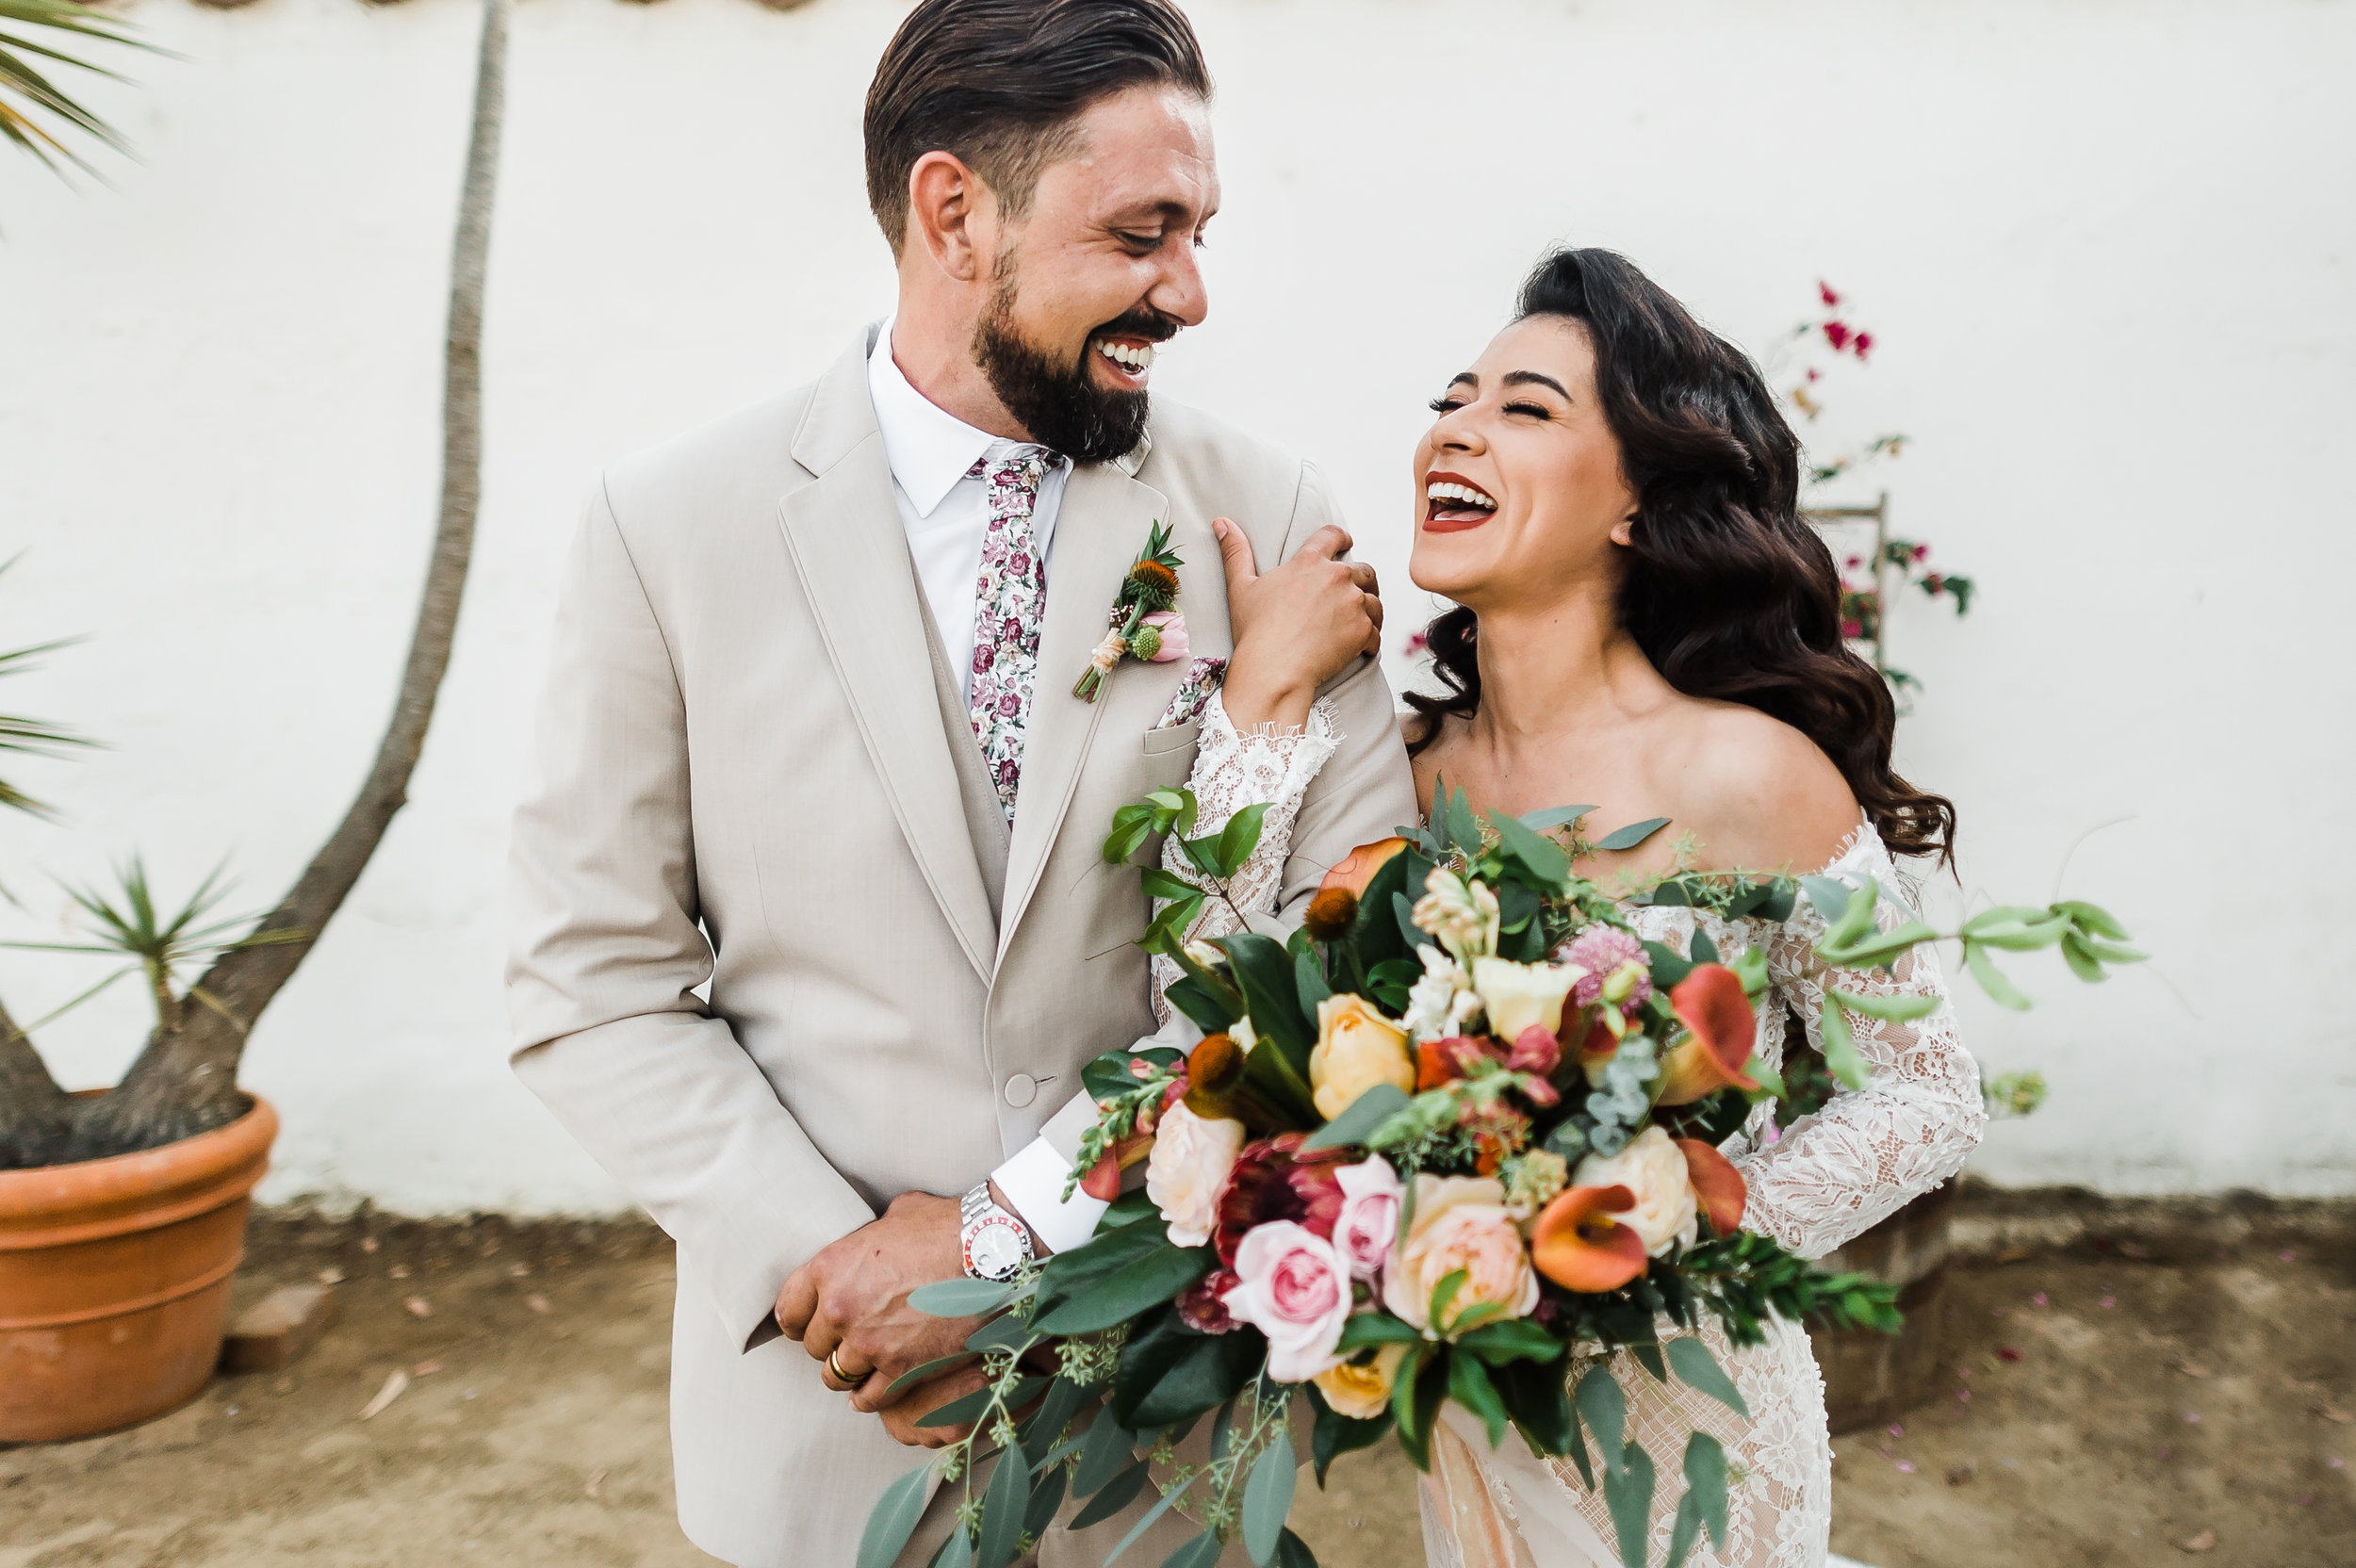 www.santabarbarawedding.com | Michelle Ramirez Photography | Olivas Adobe | Karen Marie Events | Tangled Lotus | Bride and Groom Before Ceremony